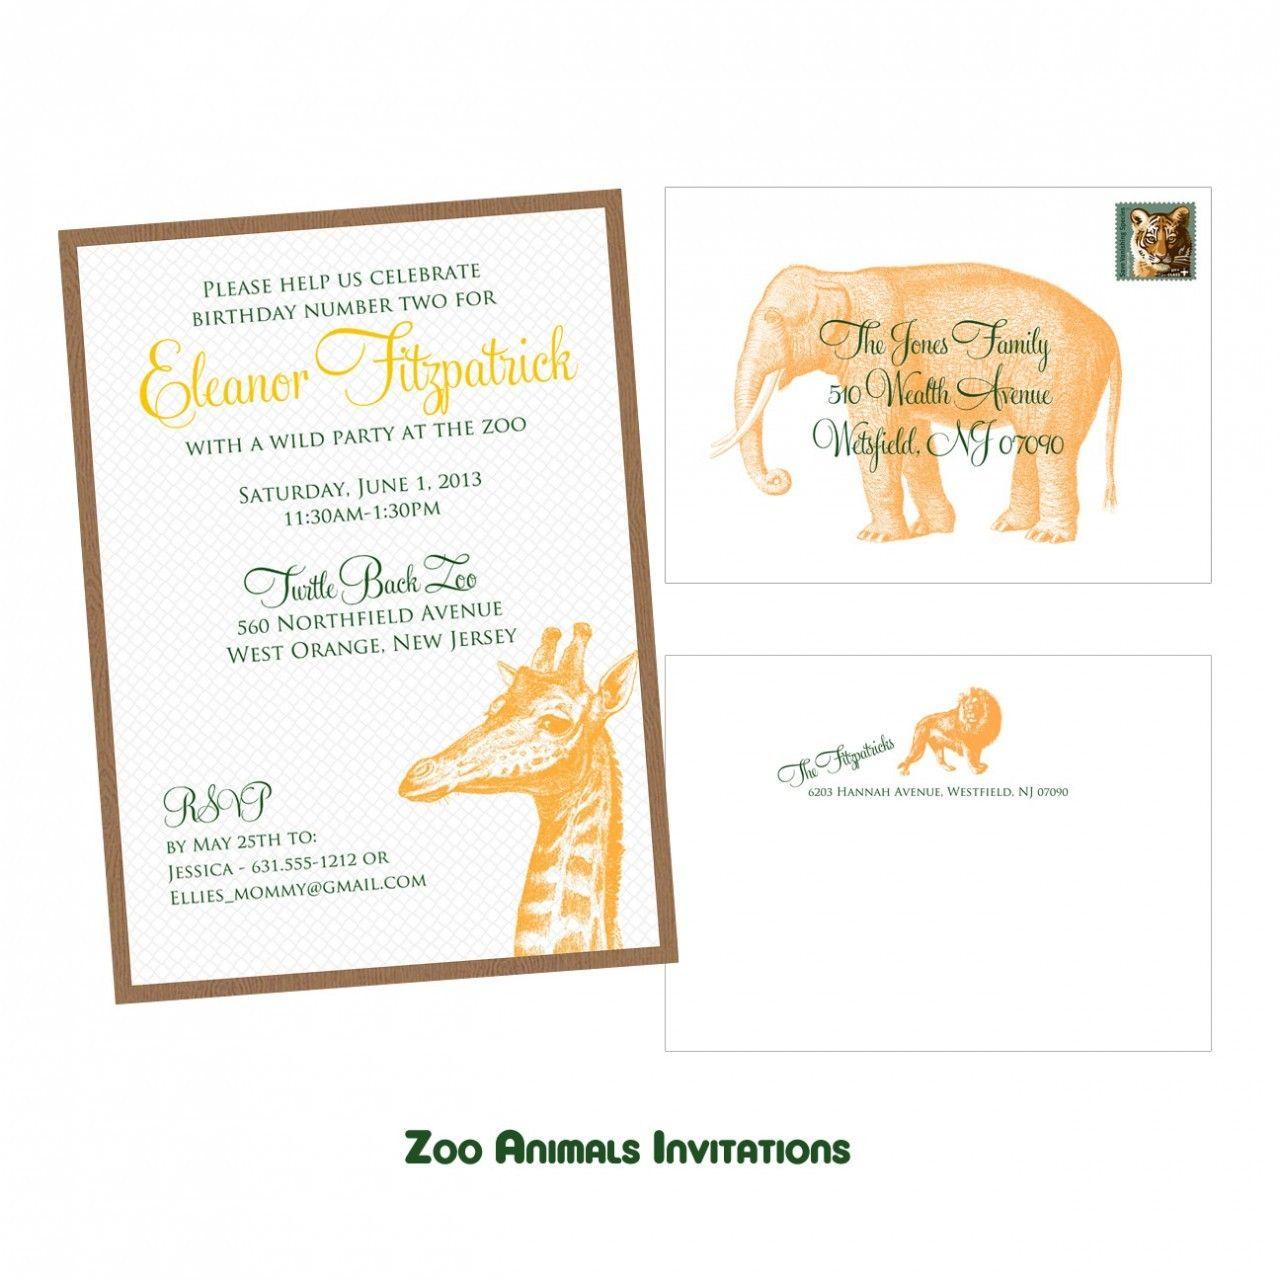 lani blue stationery  zoo animals invitation 250 http